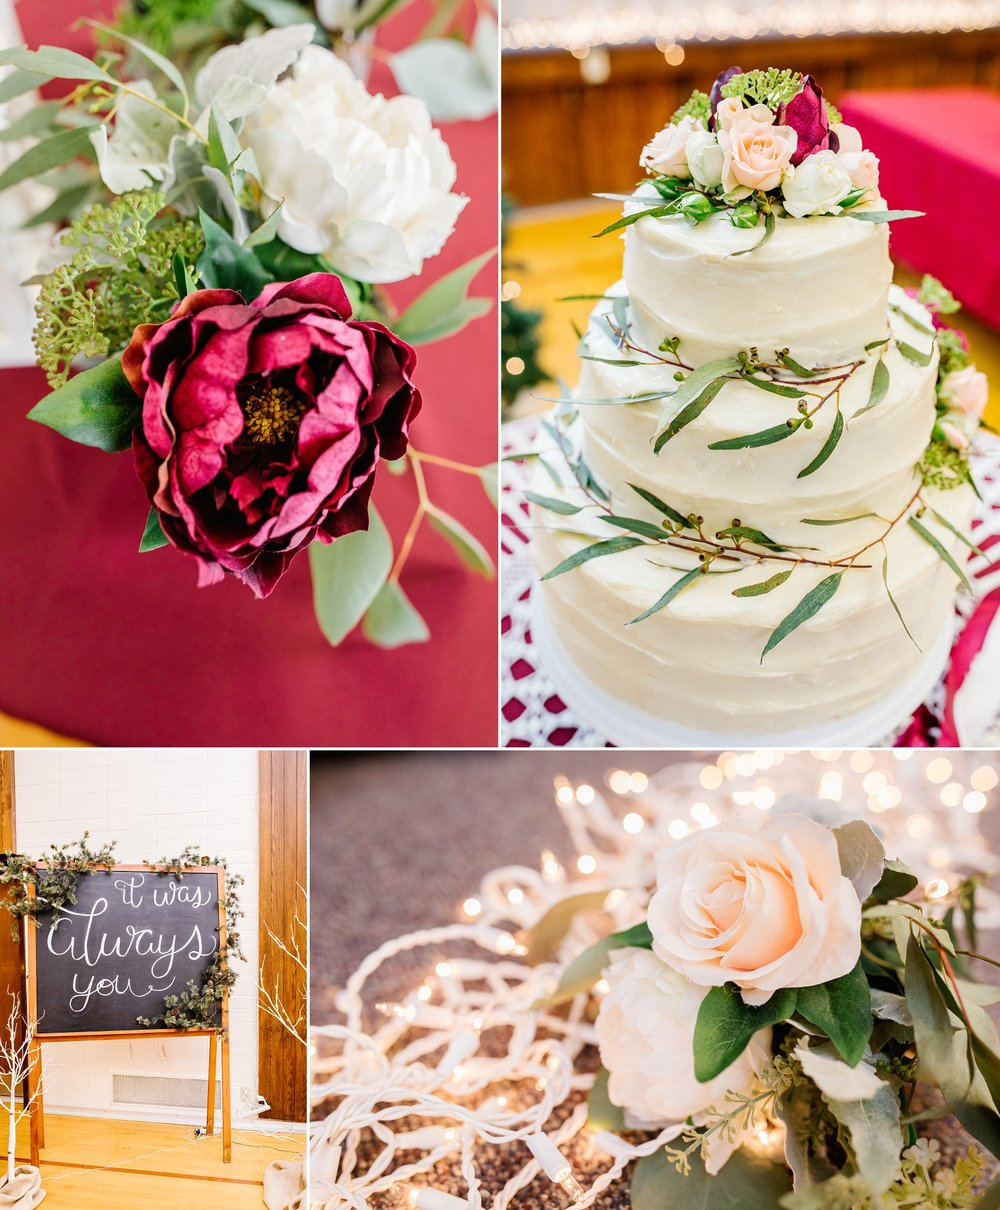 SS-Wedding-305_Lizzie-B-Imagery-Utah-Wedding-Photographer-Logan-Temple-Logan-Canyon-Mountain-Horse-Session.jpg